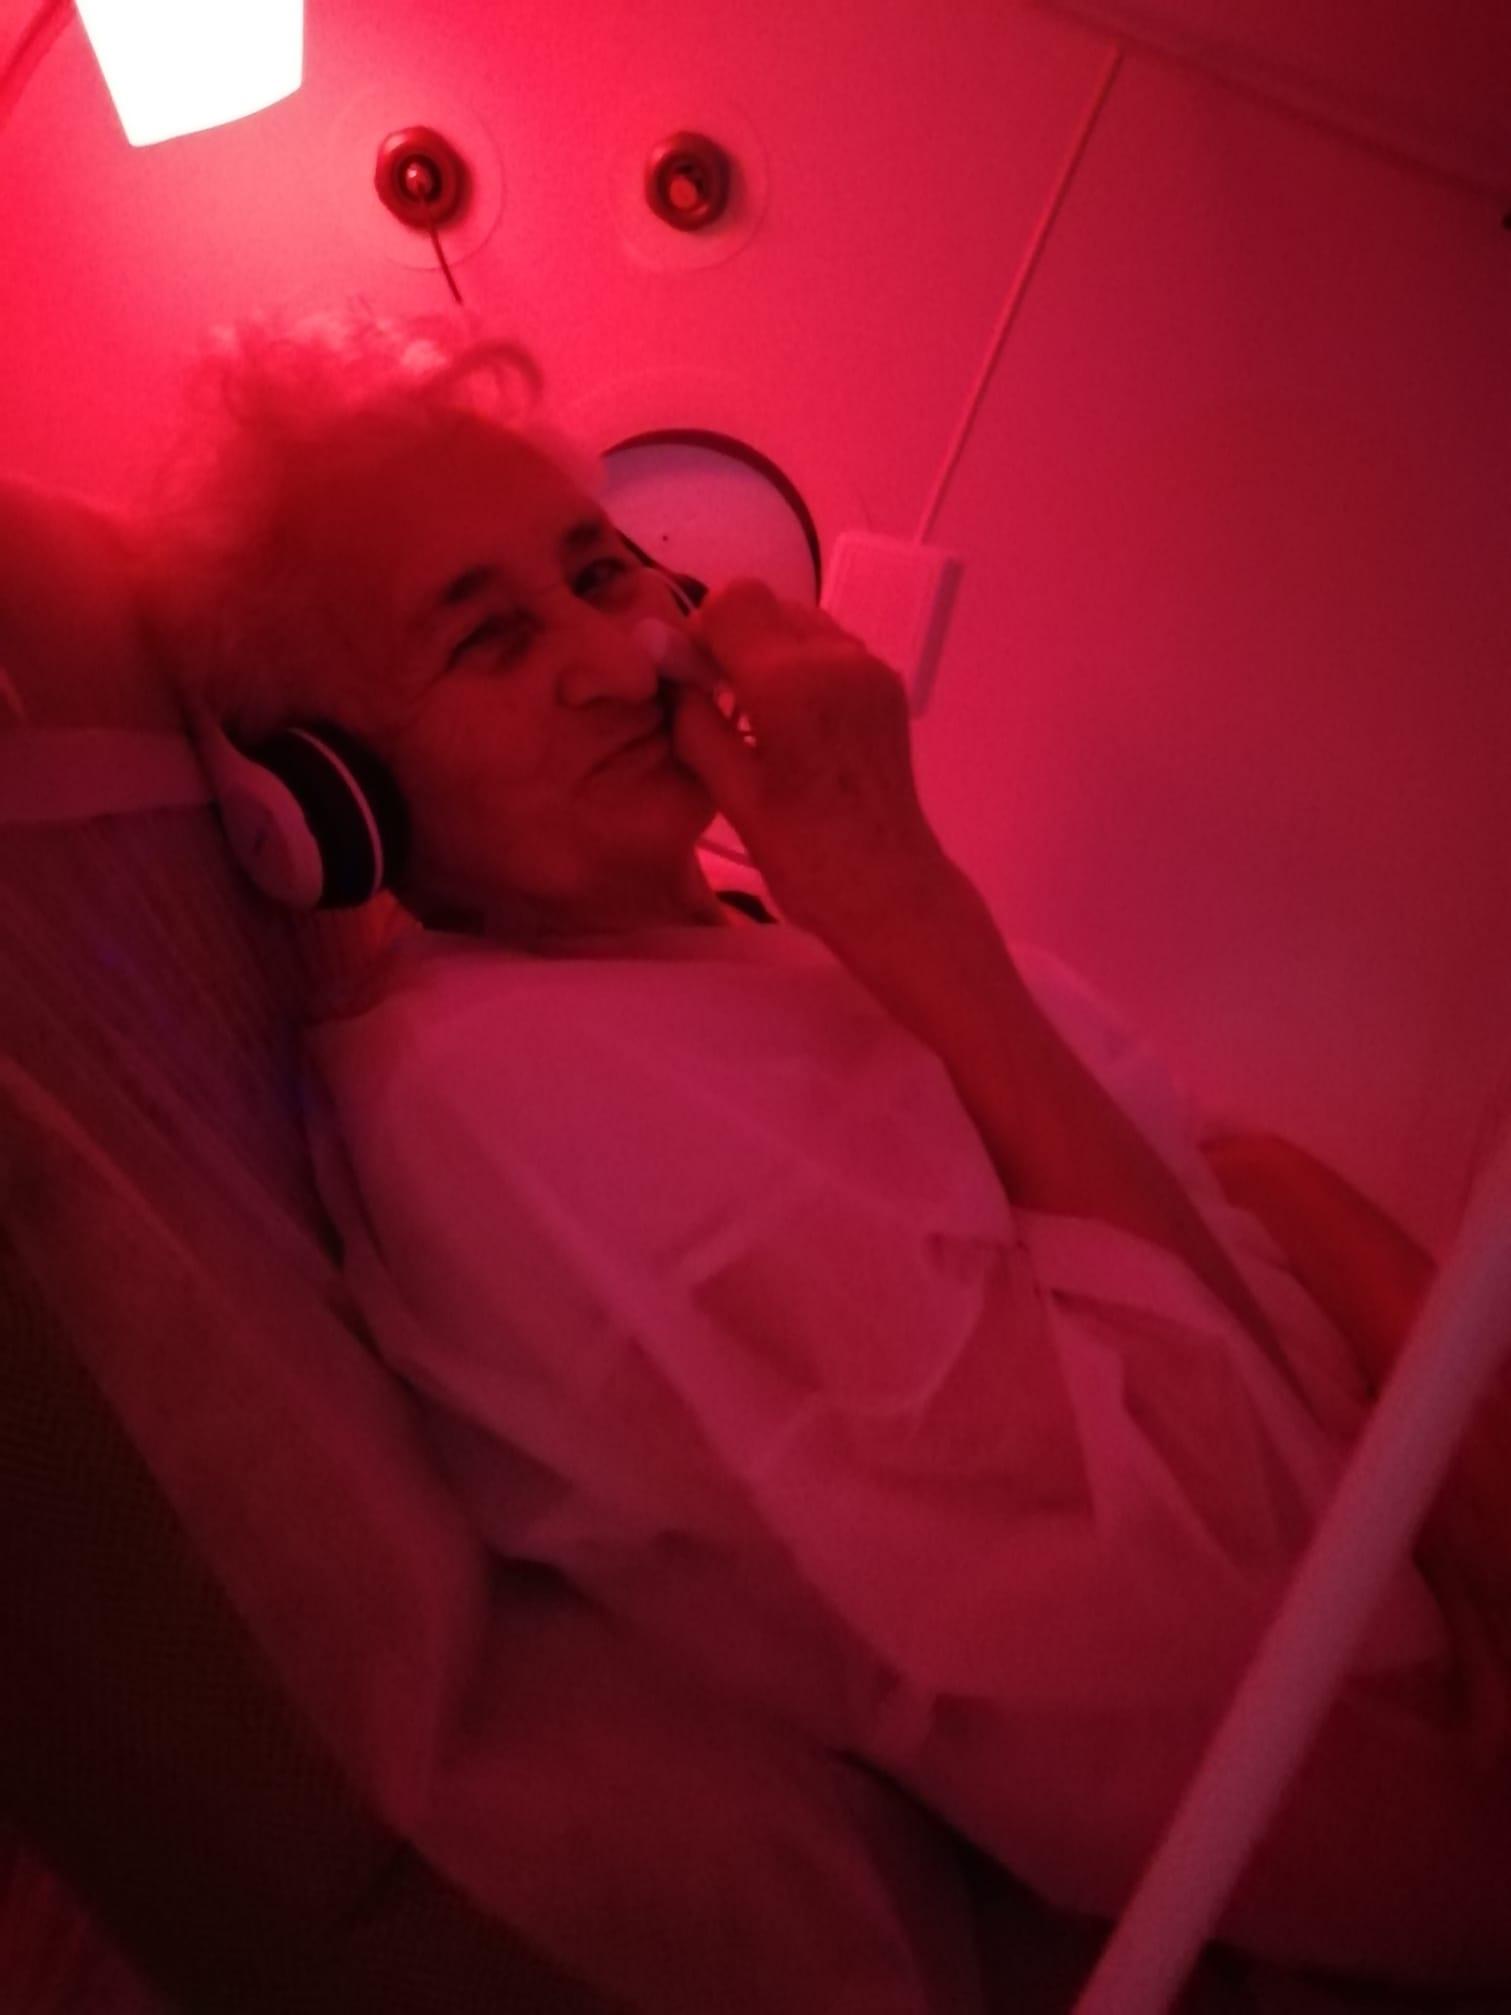 komora hiperbaryczna nowe technologie tlenoterapia